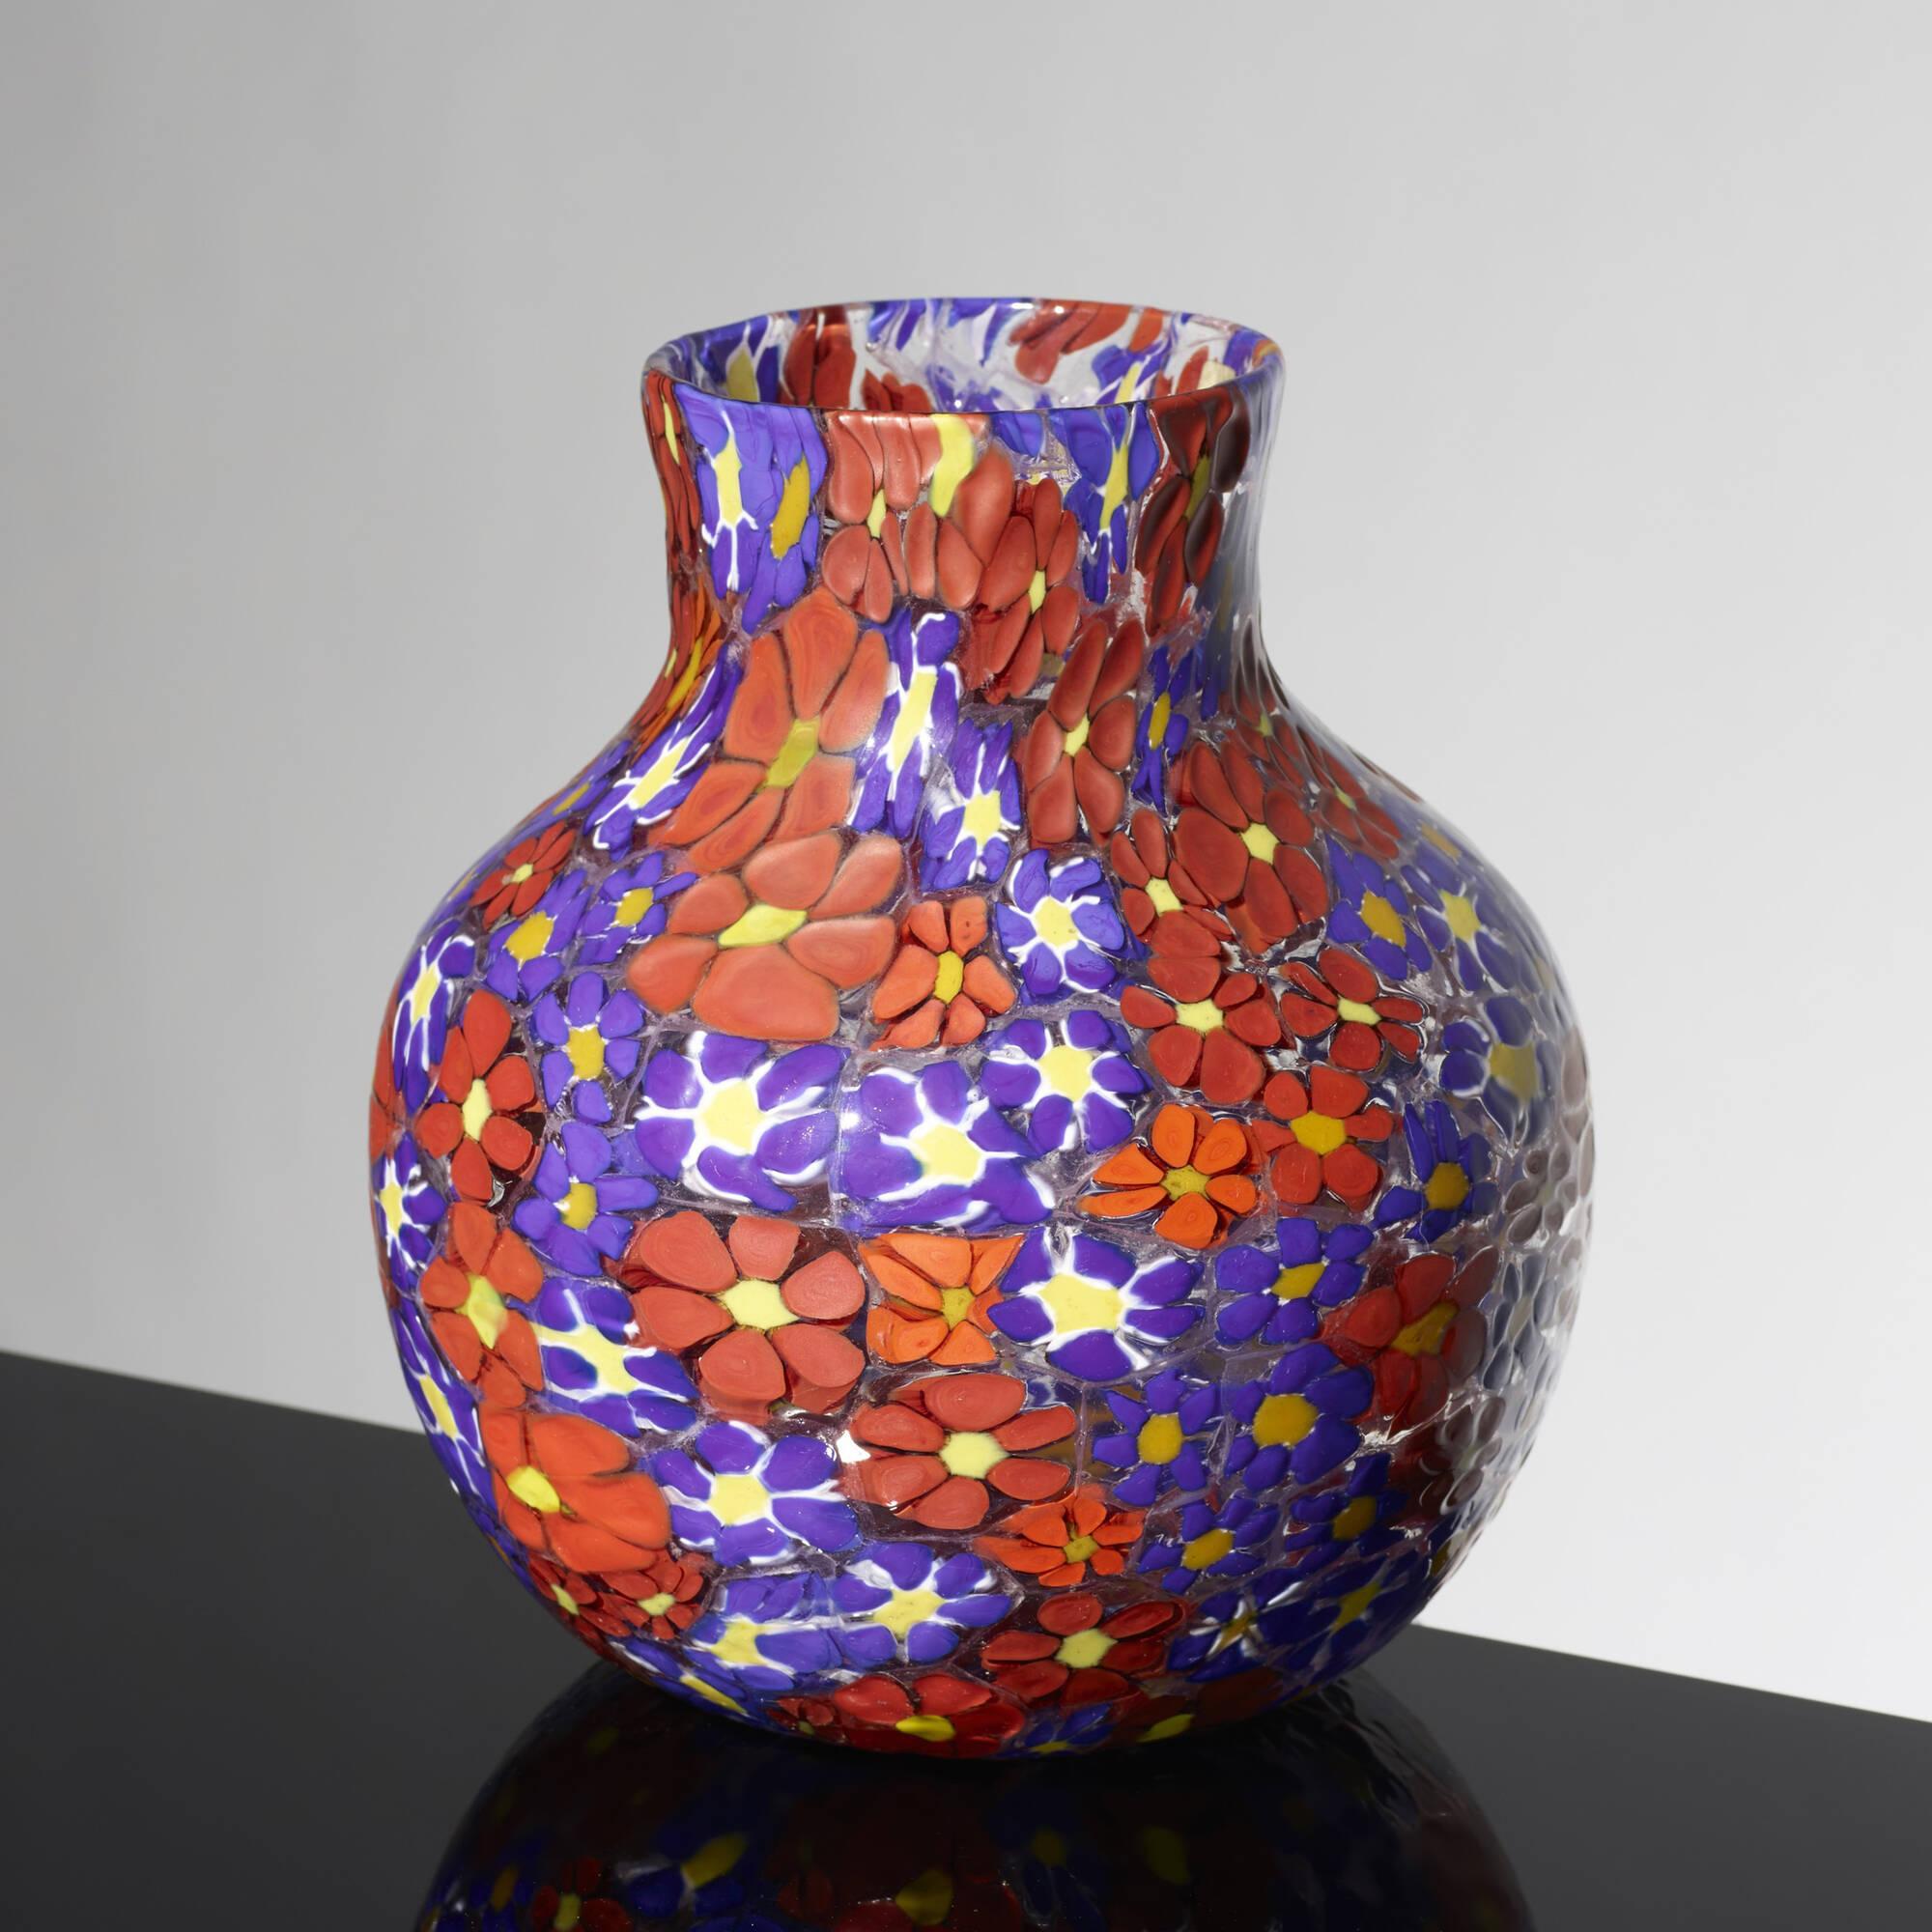 180: Fratelli Toso / Kiku vase (2 of 2)